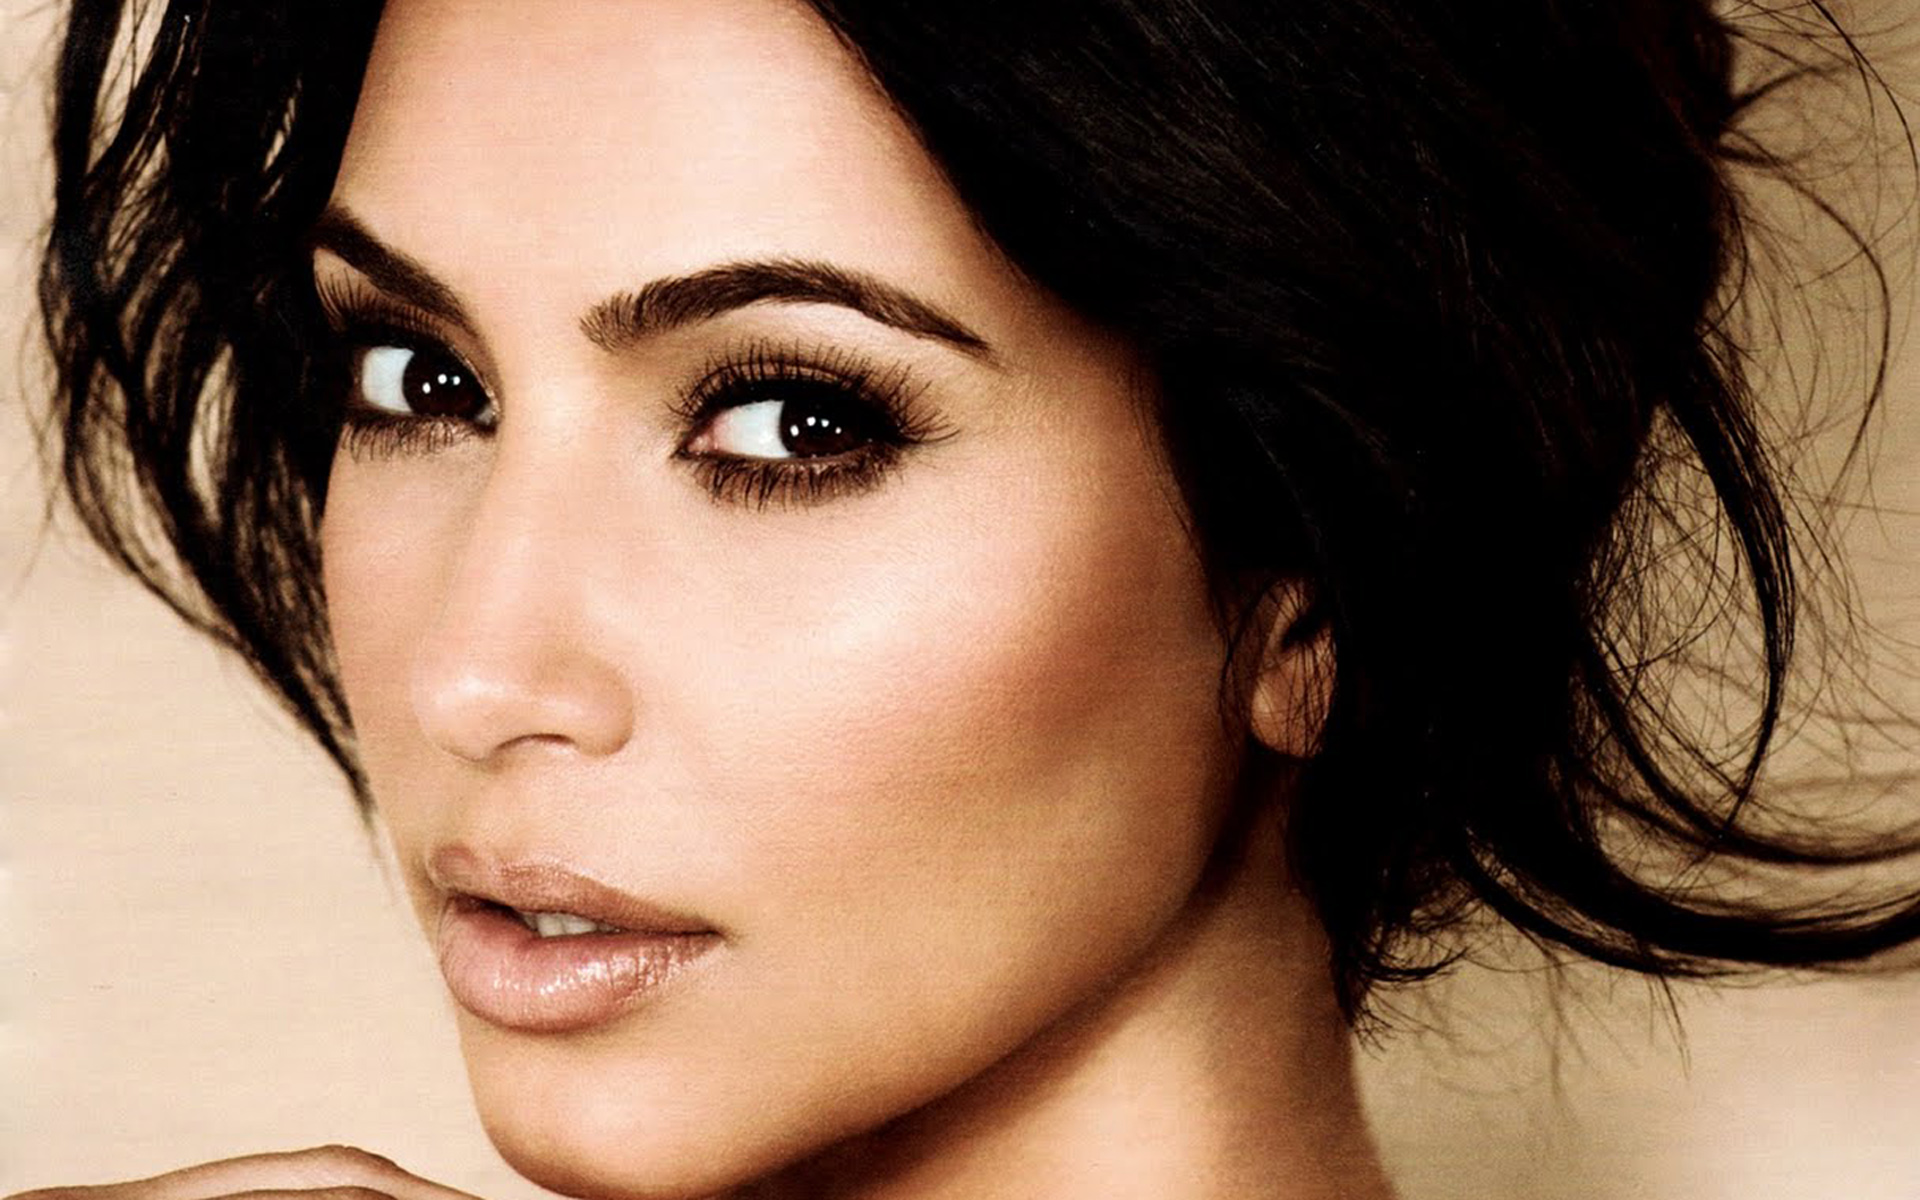 Kim kardashian without photoshop